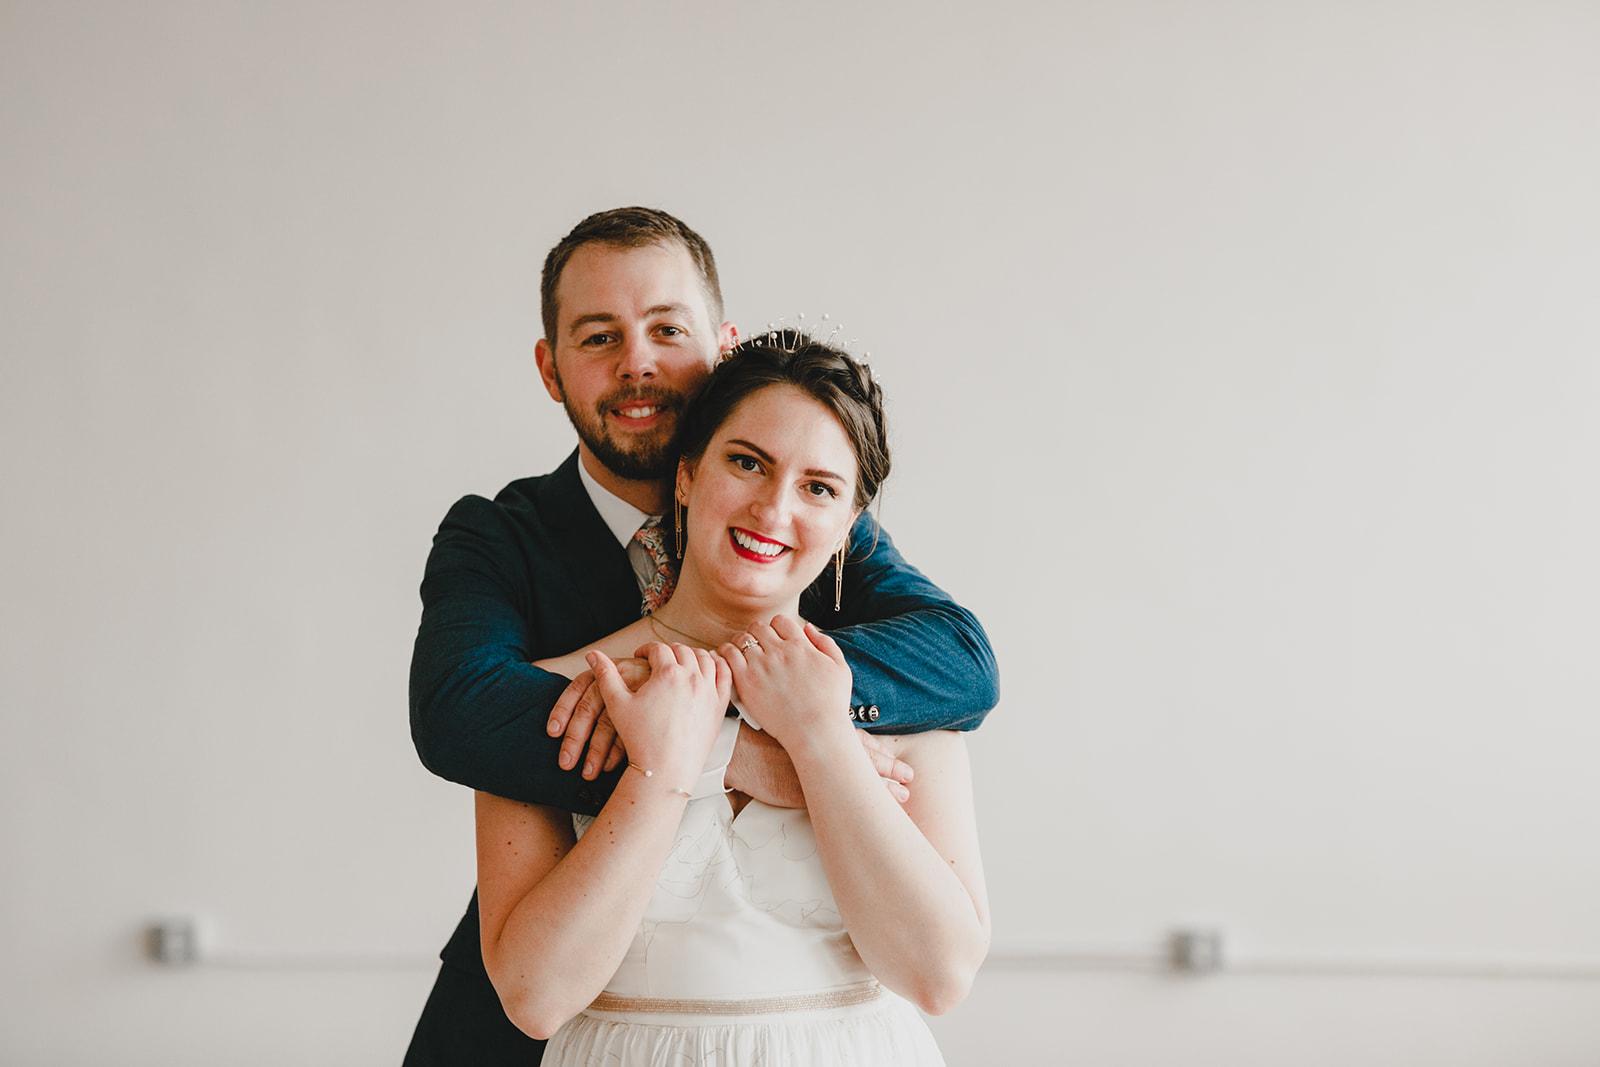 bok-wedding-philadelphia-sarah-rich-16.jpg